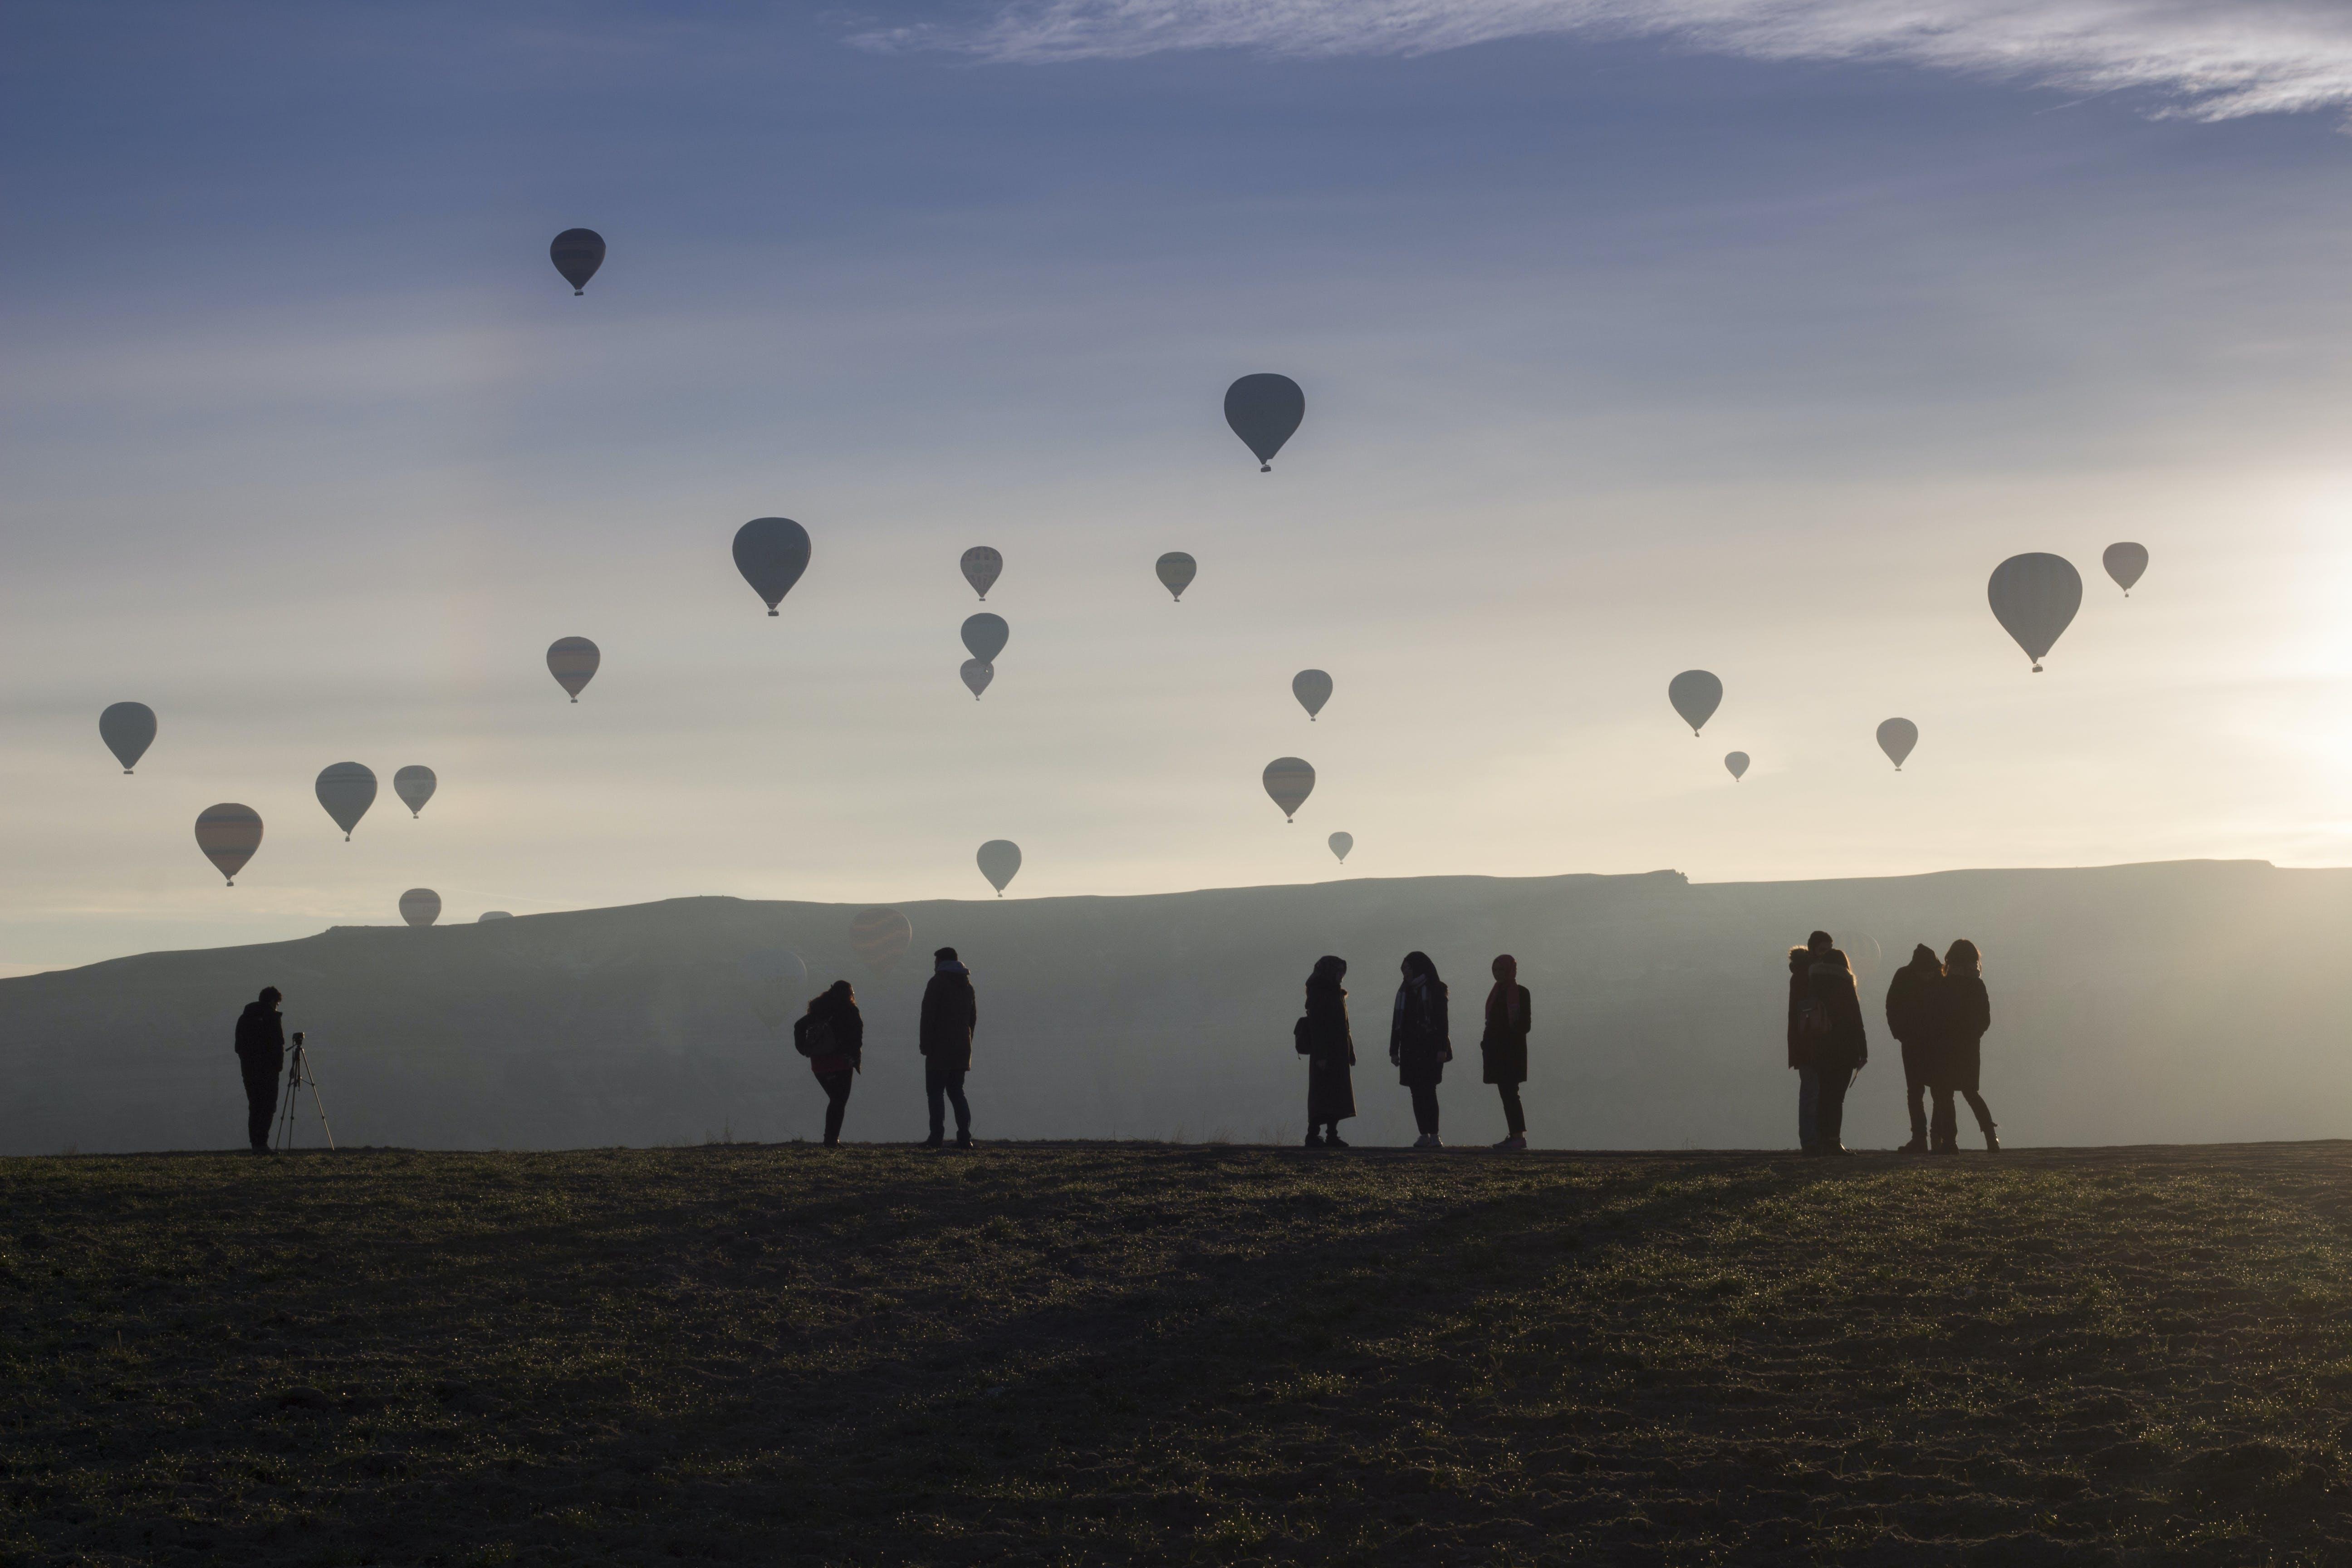 Free stock photo of cappadocia, hot air balloons, love valley, people